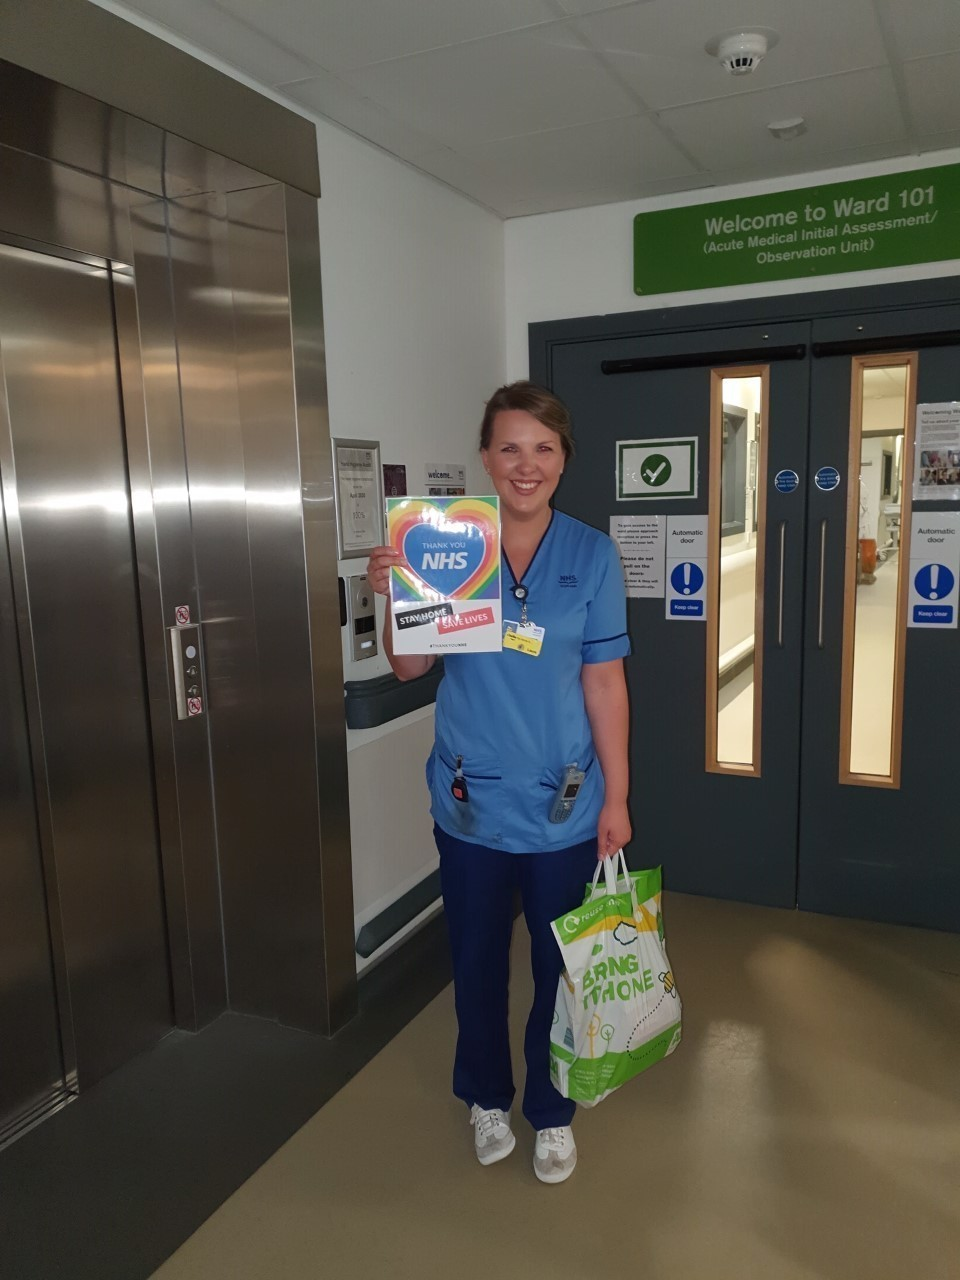 Ward 101, Aberdeen Royal Infirmary | Asda Dyce